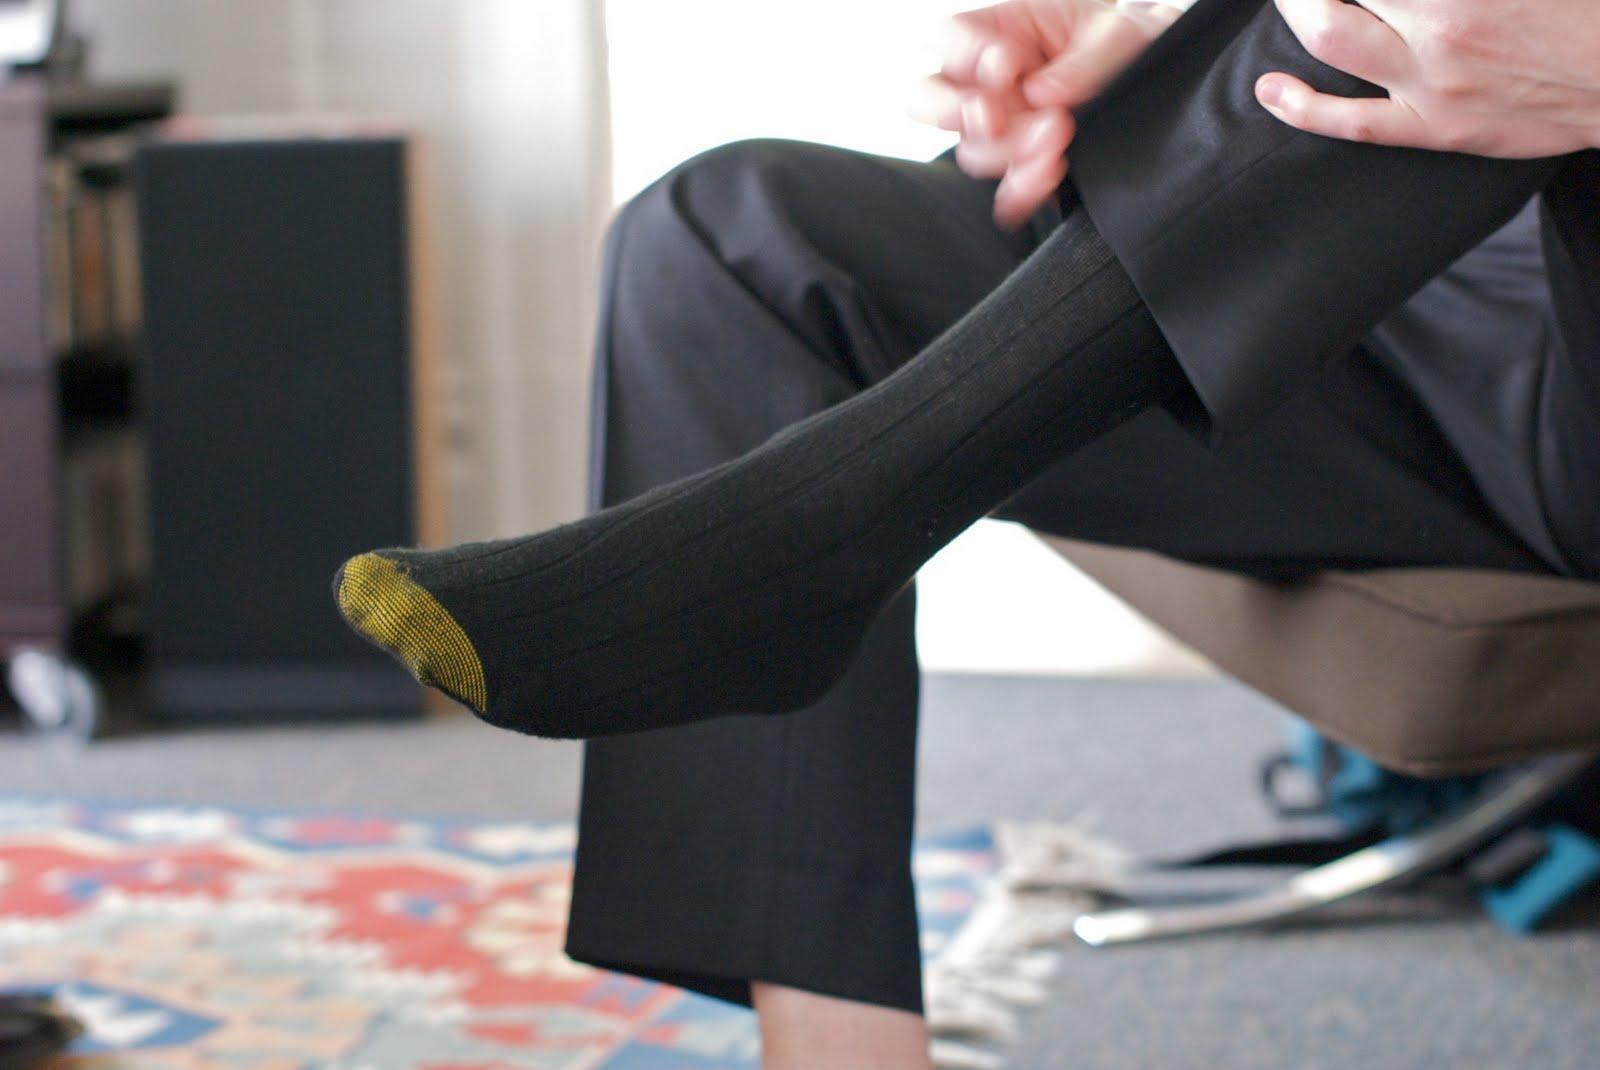 времена, картинки про мужские носки надетые свет